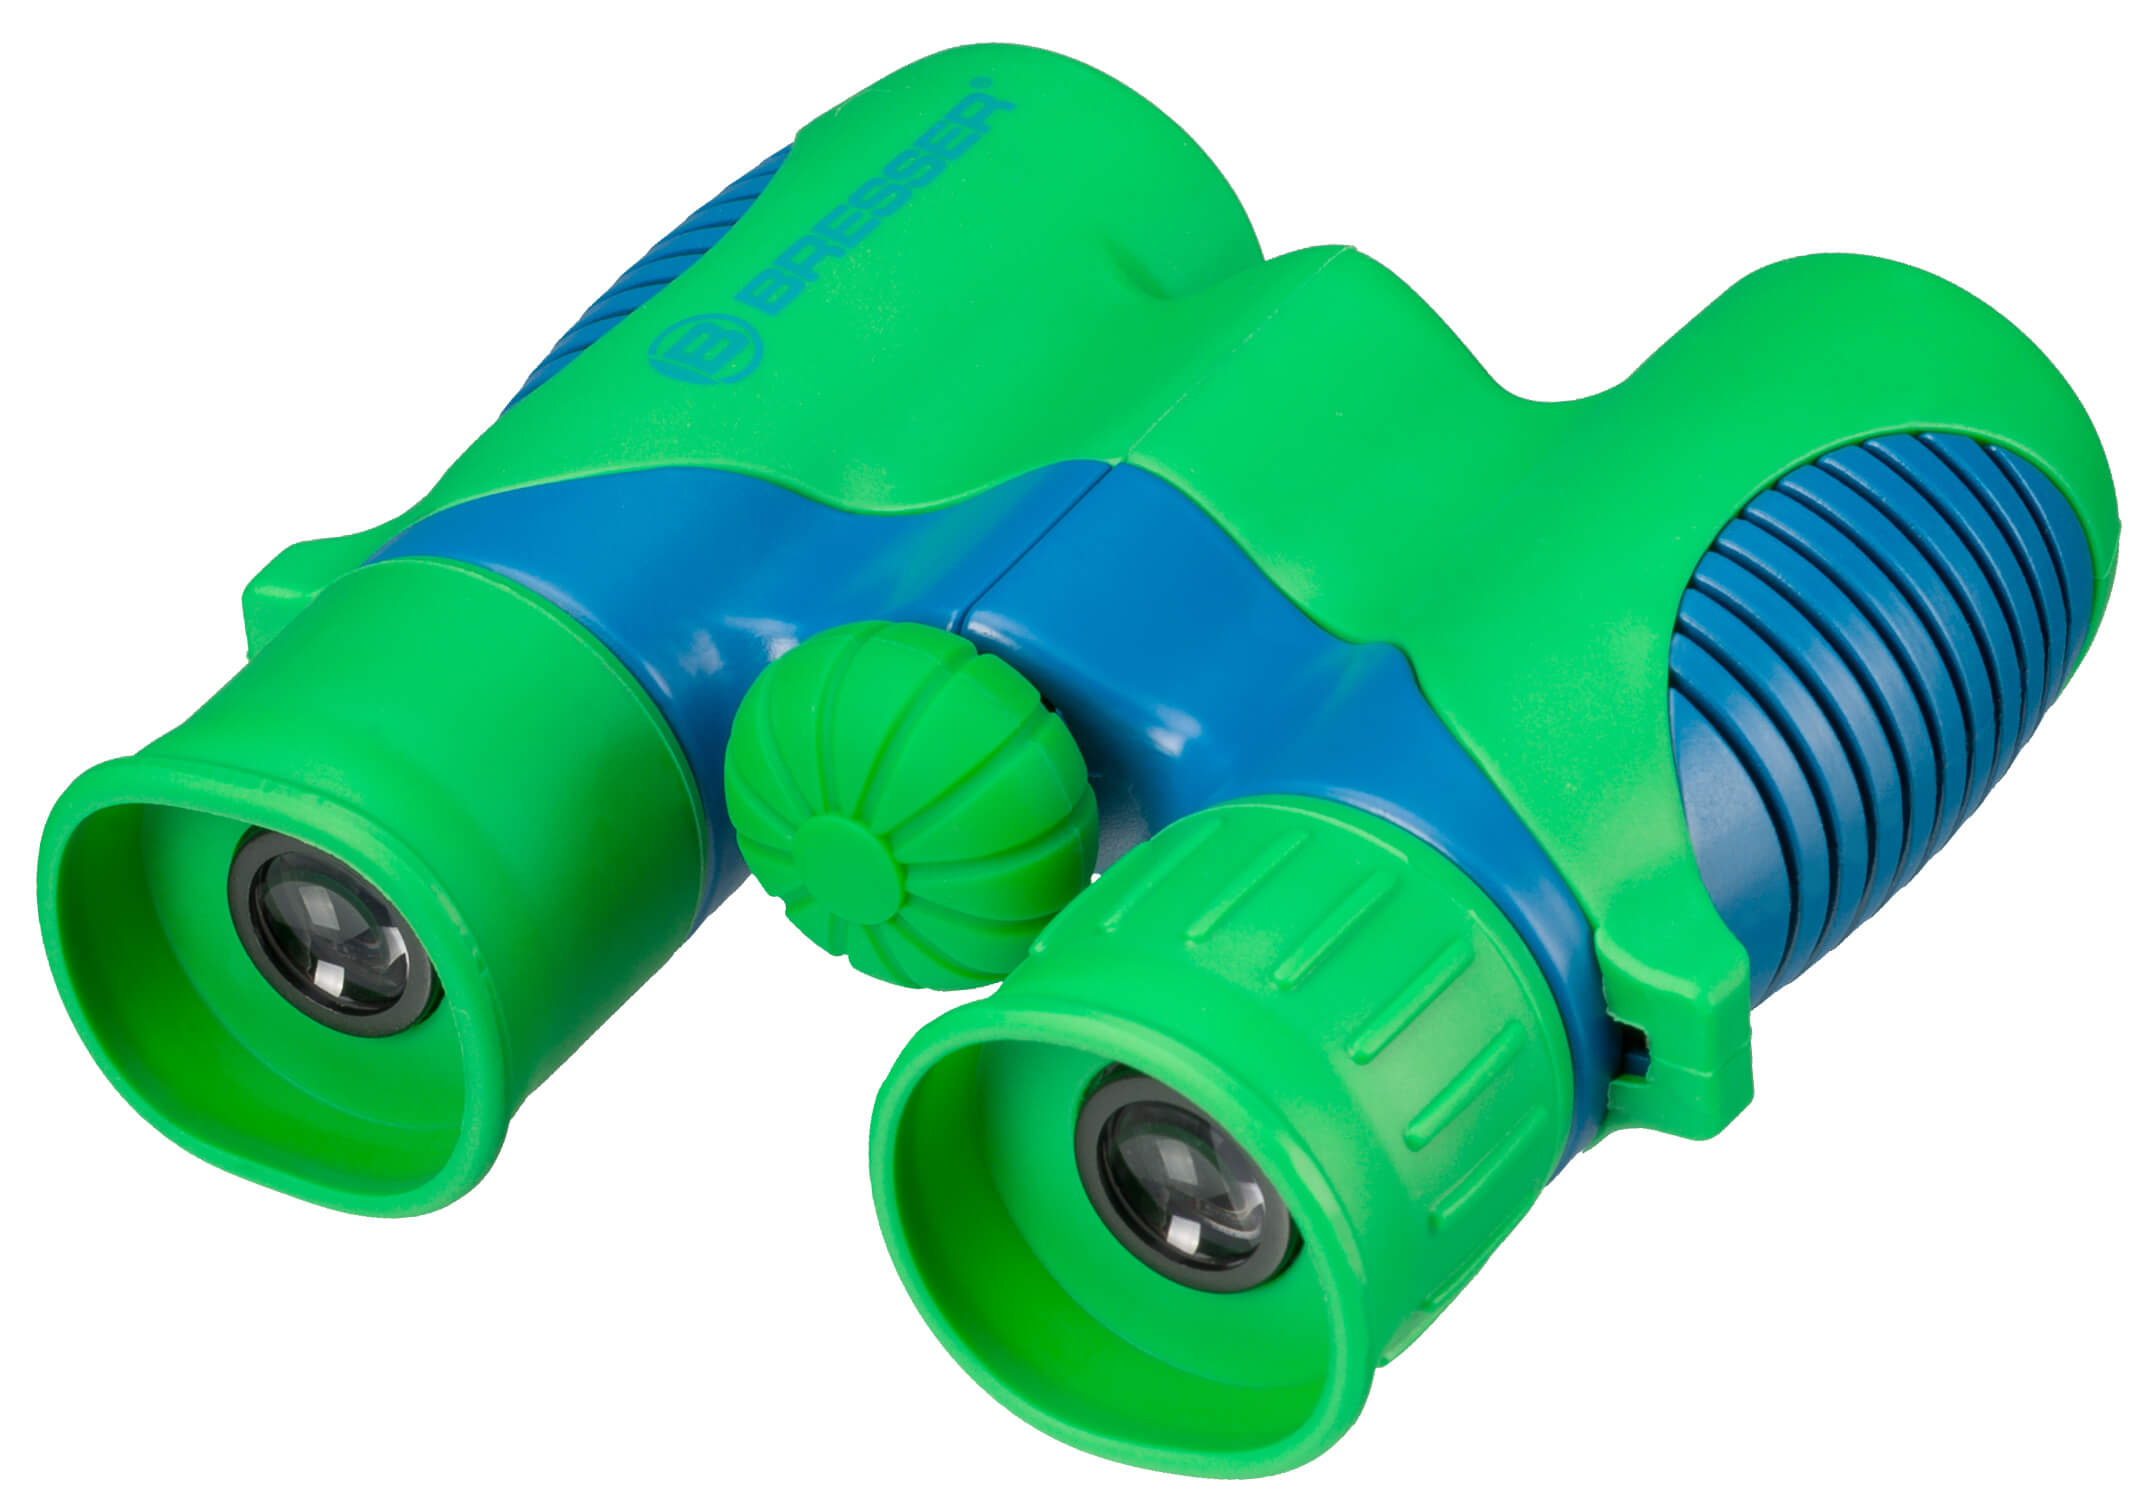 Bresser ExploreOne 6x21 Binoculars